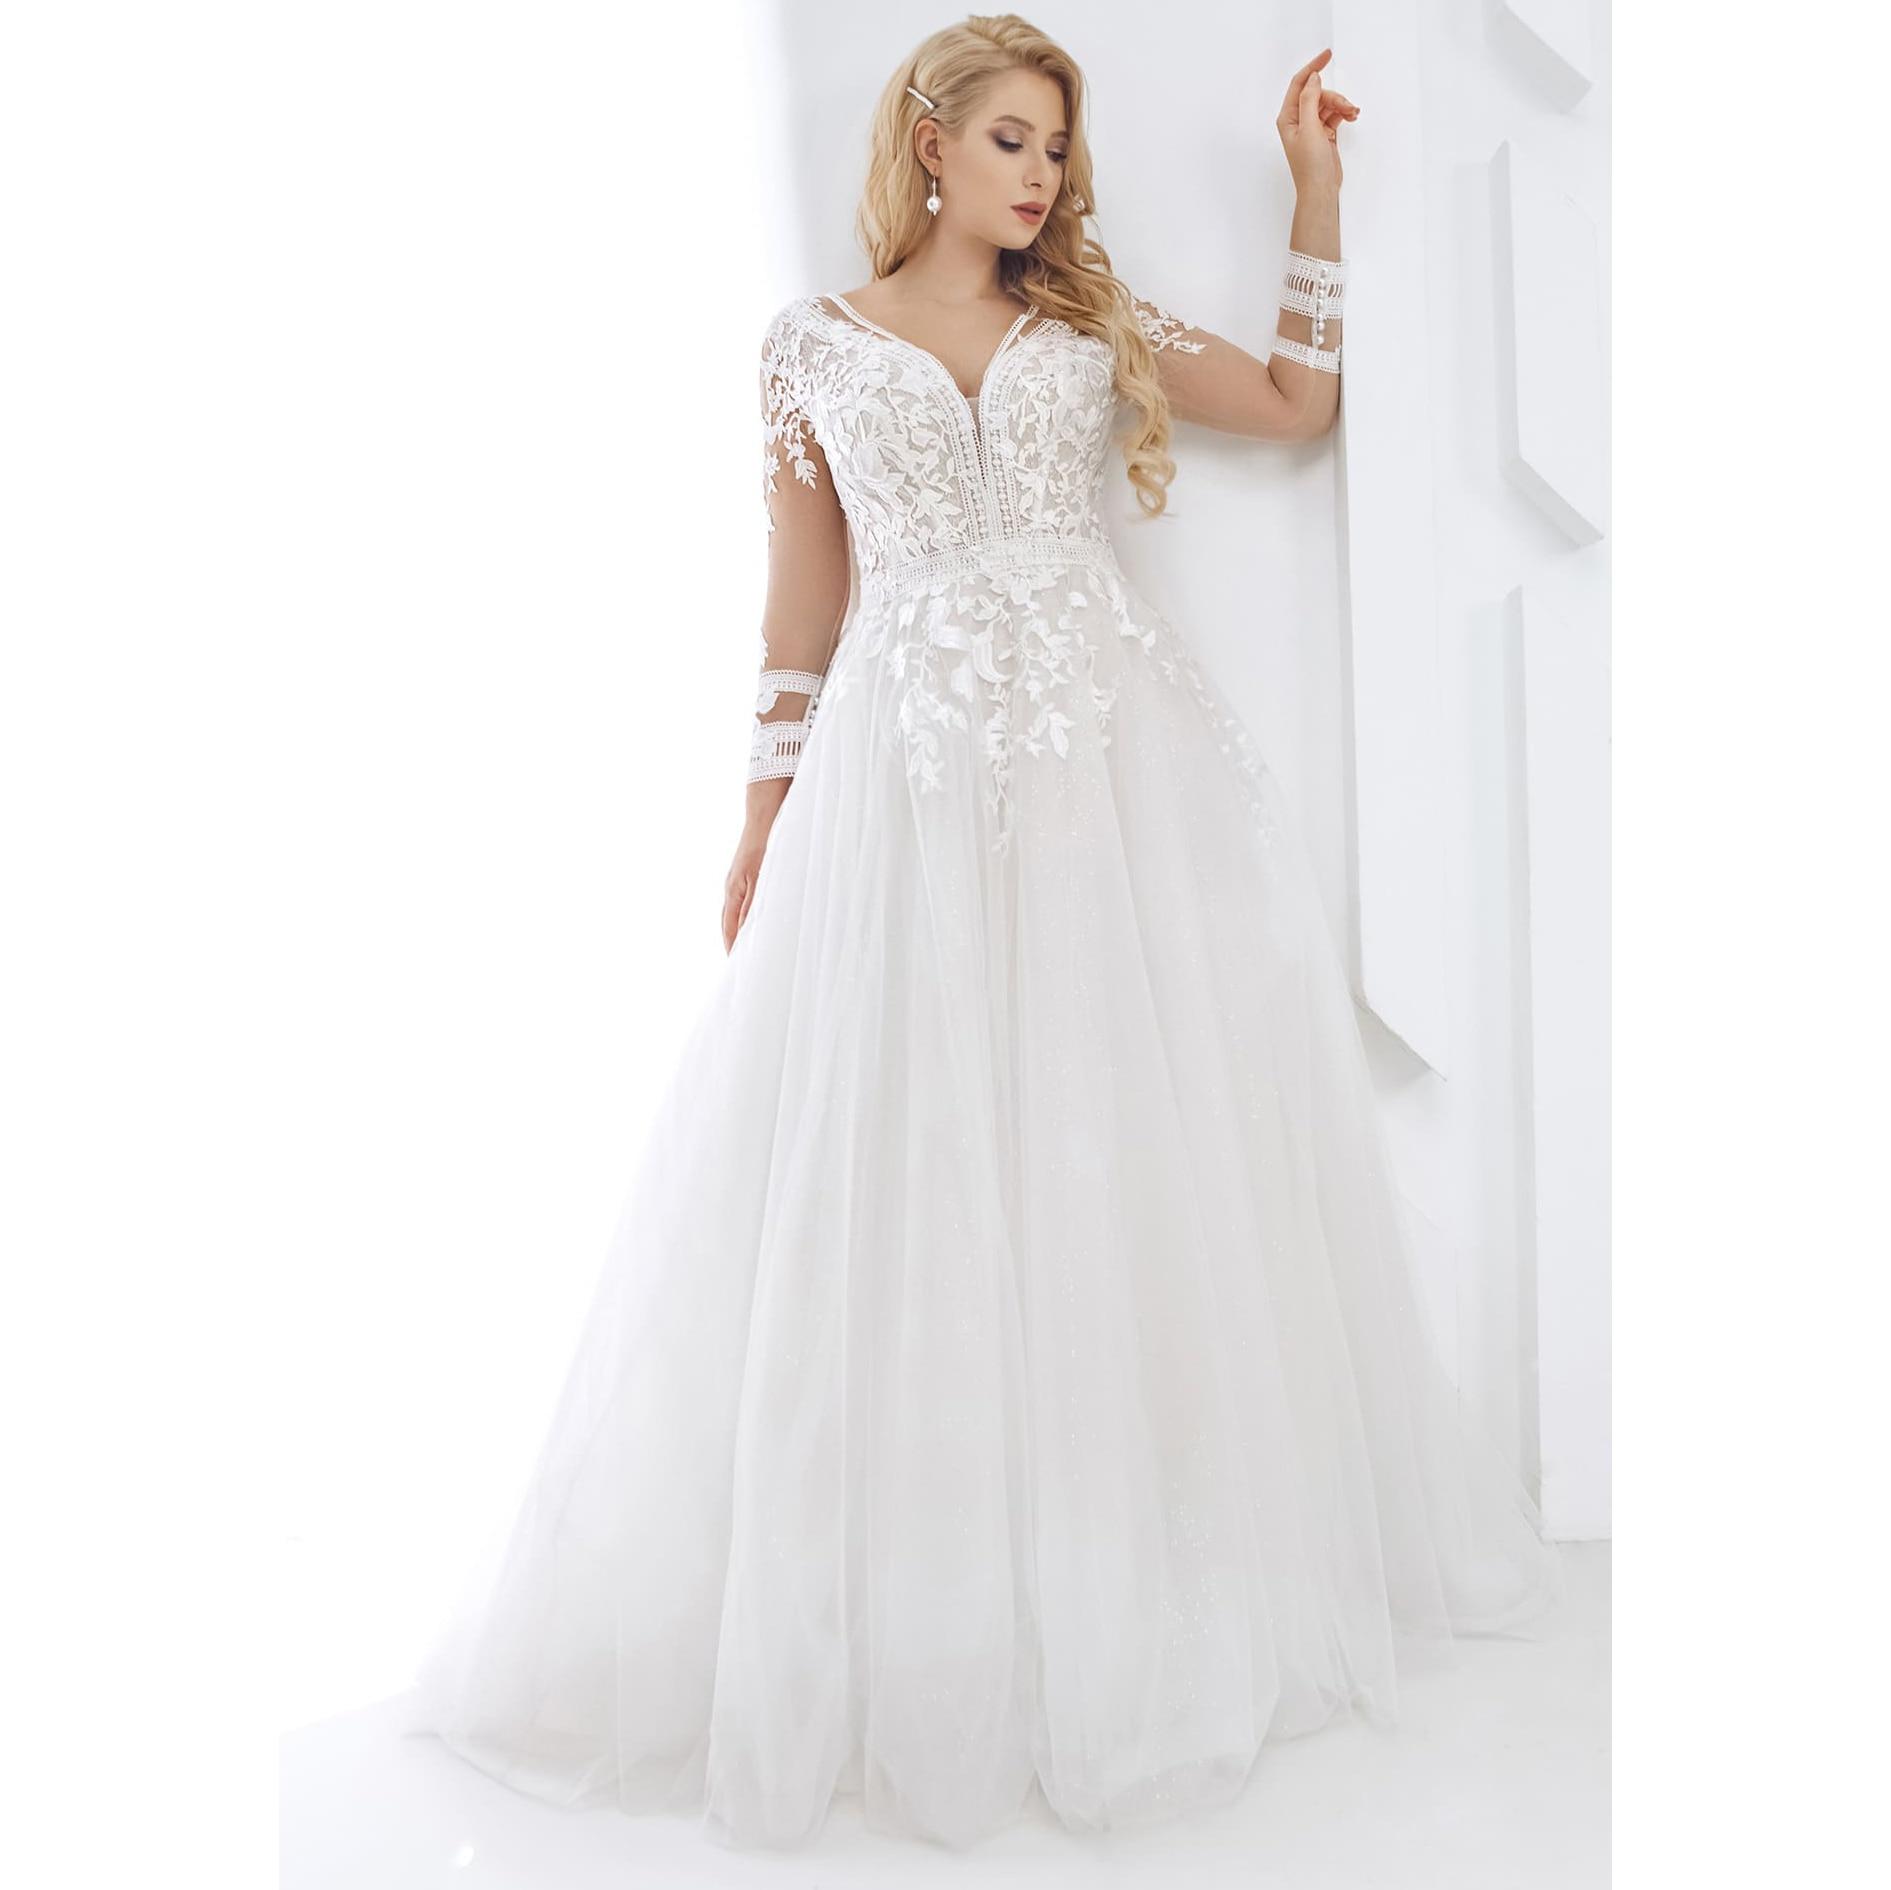 Custom Made Plus Size Long Sleeve V Neck Wedding Dress Lace Appliques A Line Bride Dress For Big Size Women